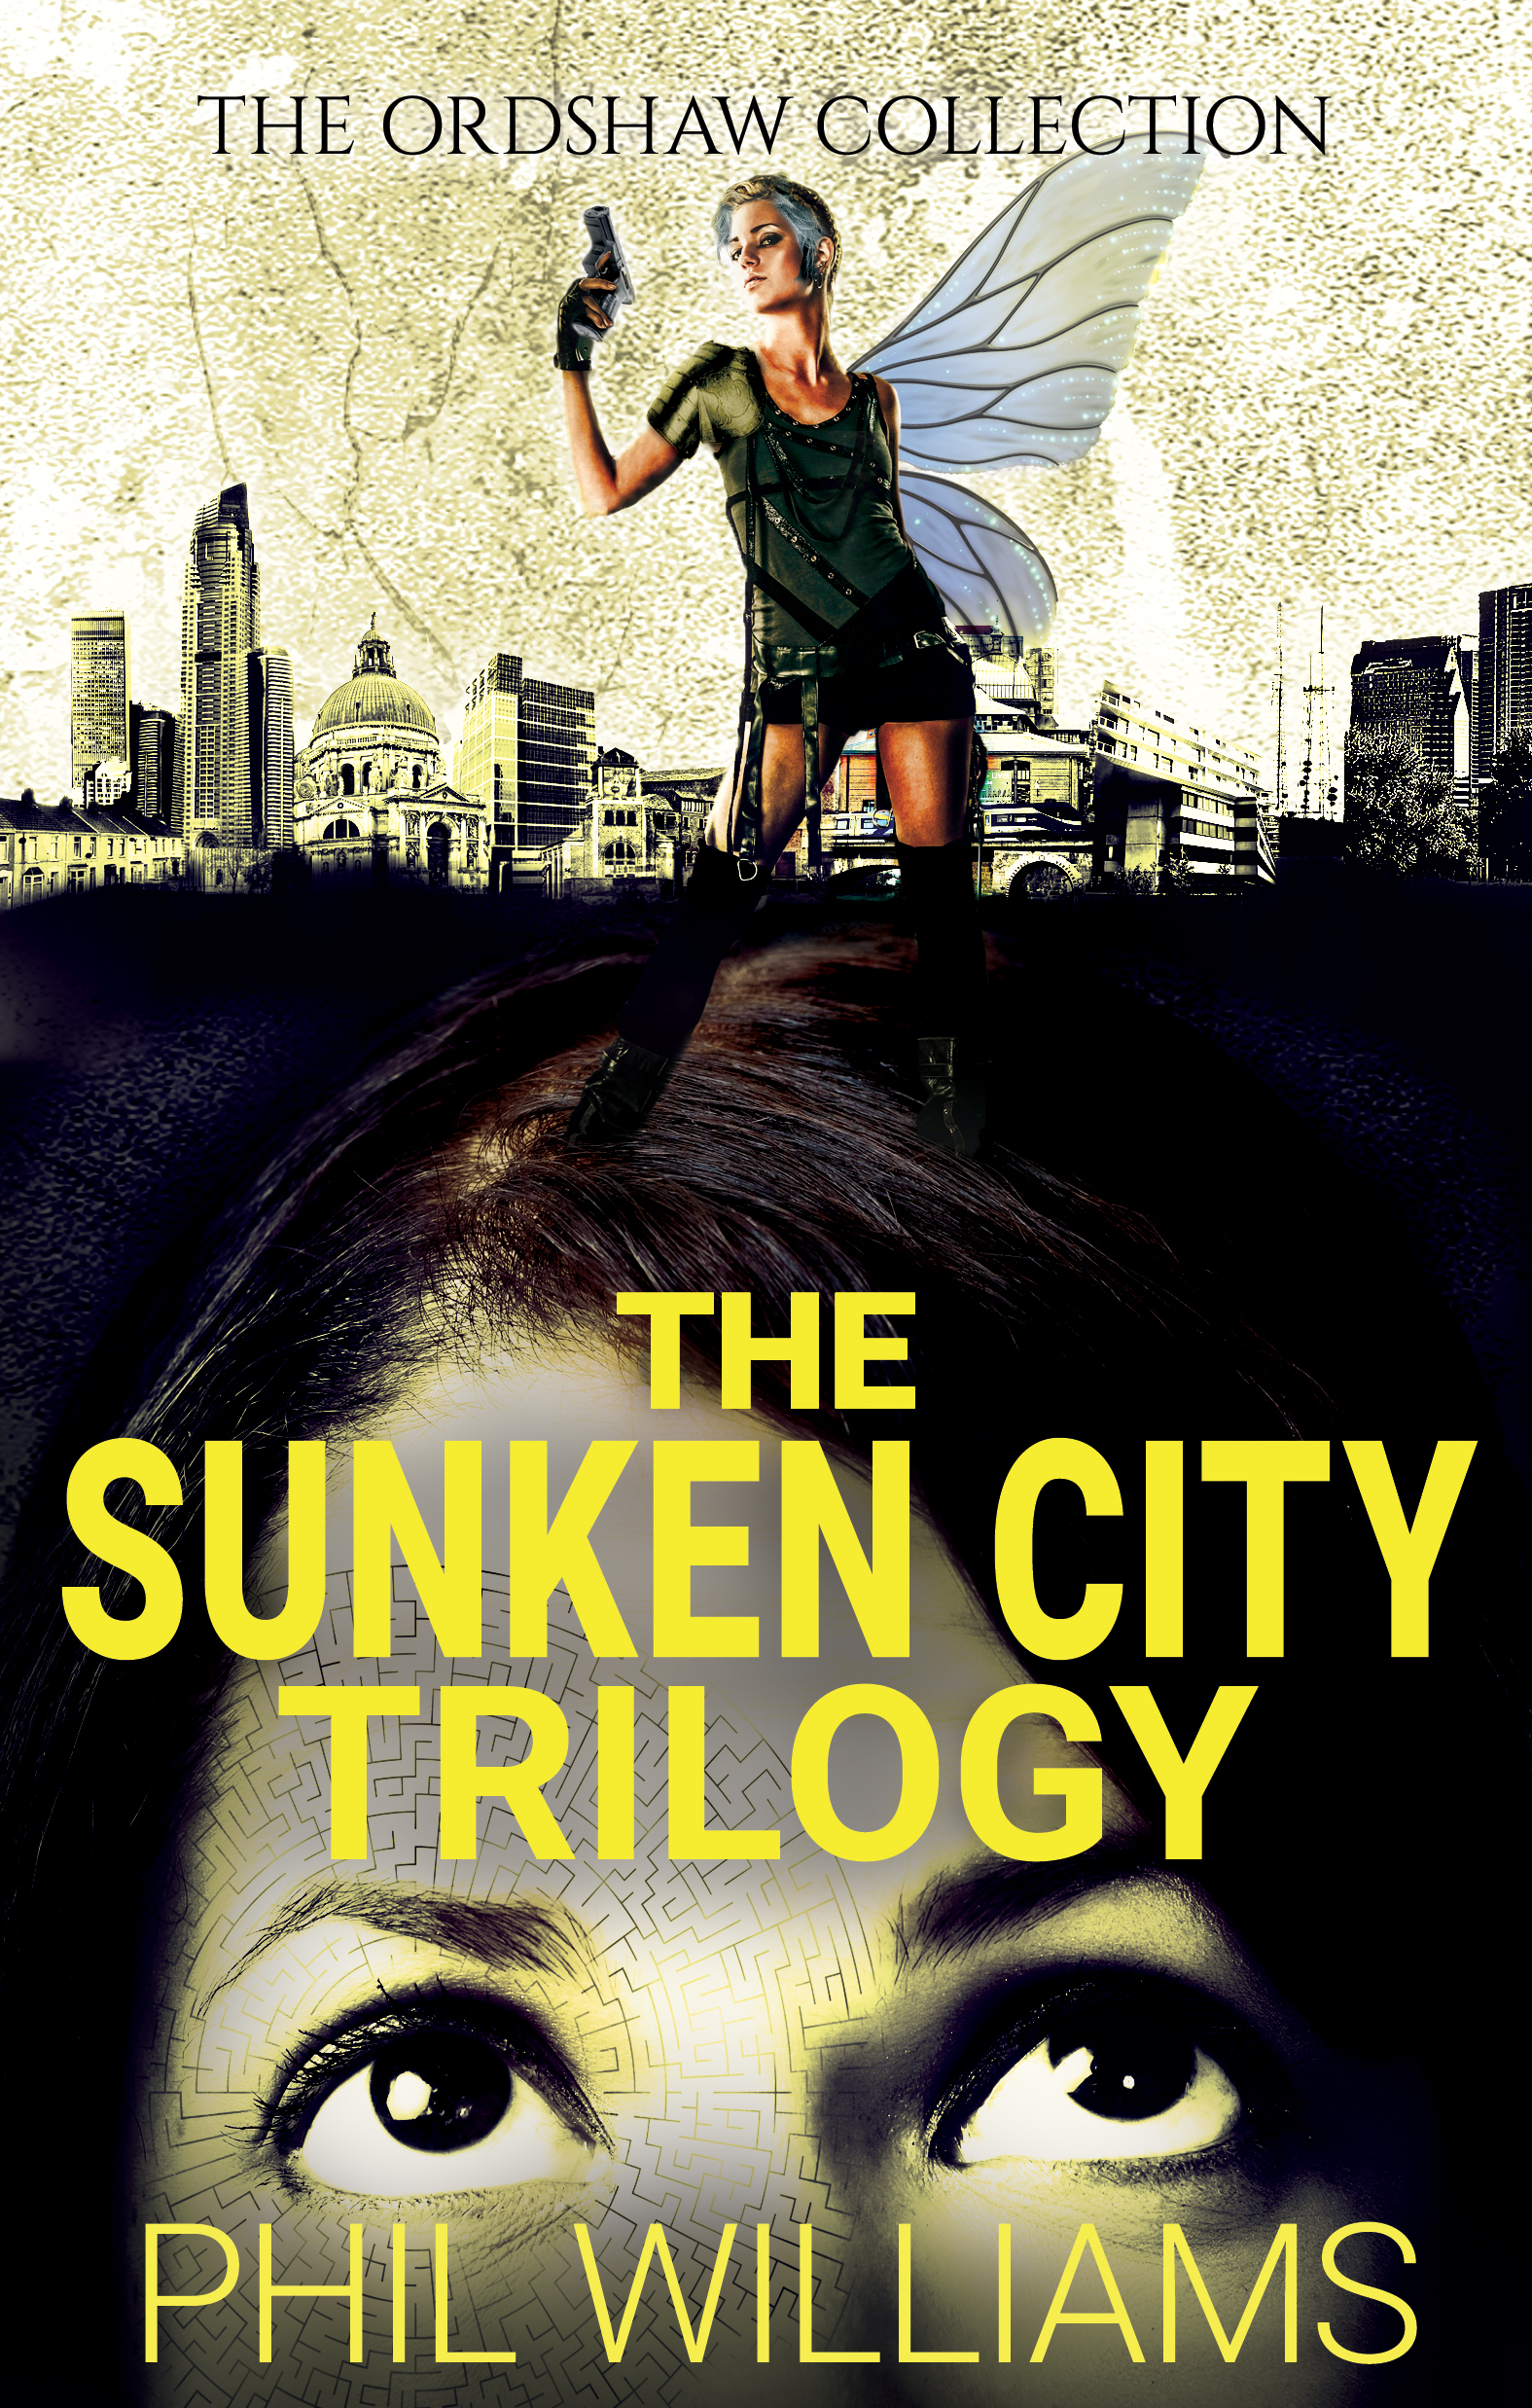 The Sunken City Trilogy